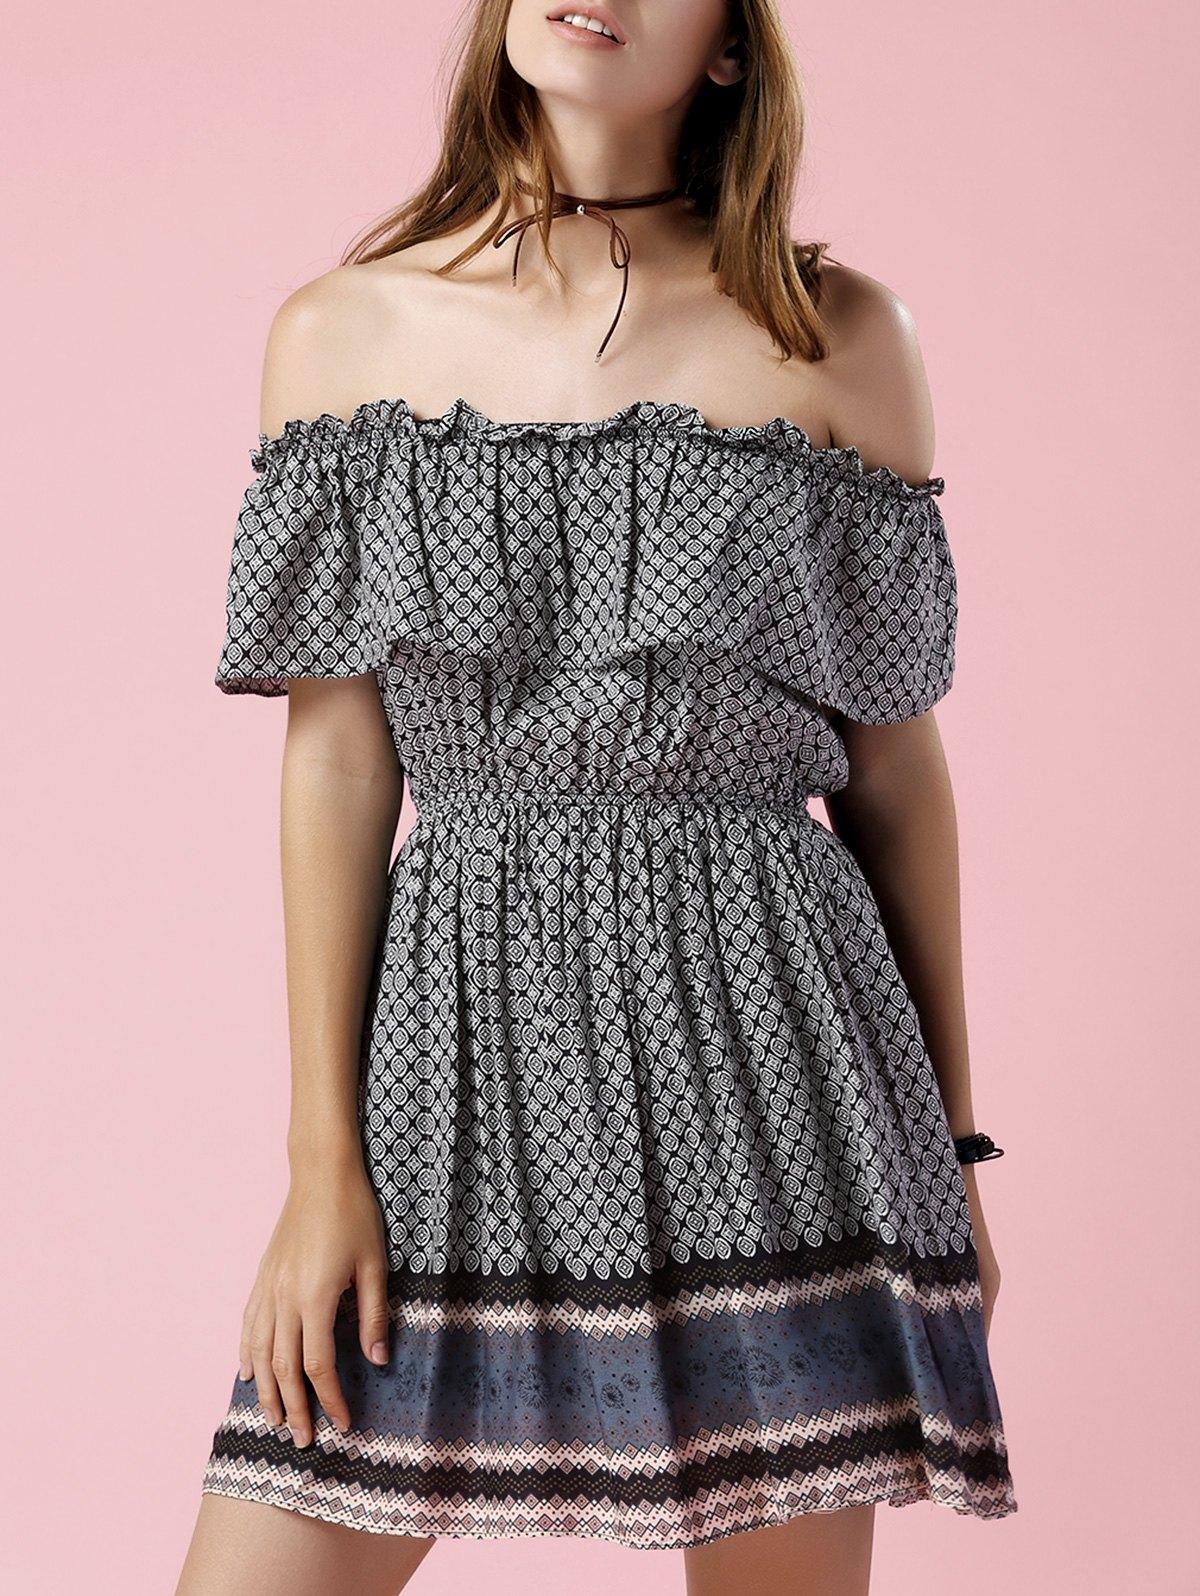 Printed Off The Shoulder Waisted Mini DressClothes<br><br><br>Size: 2XL<br>Color: BLACK GREY